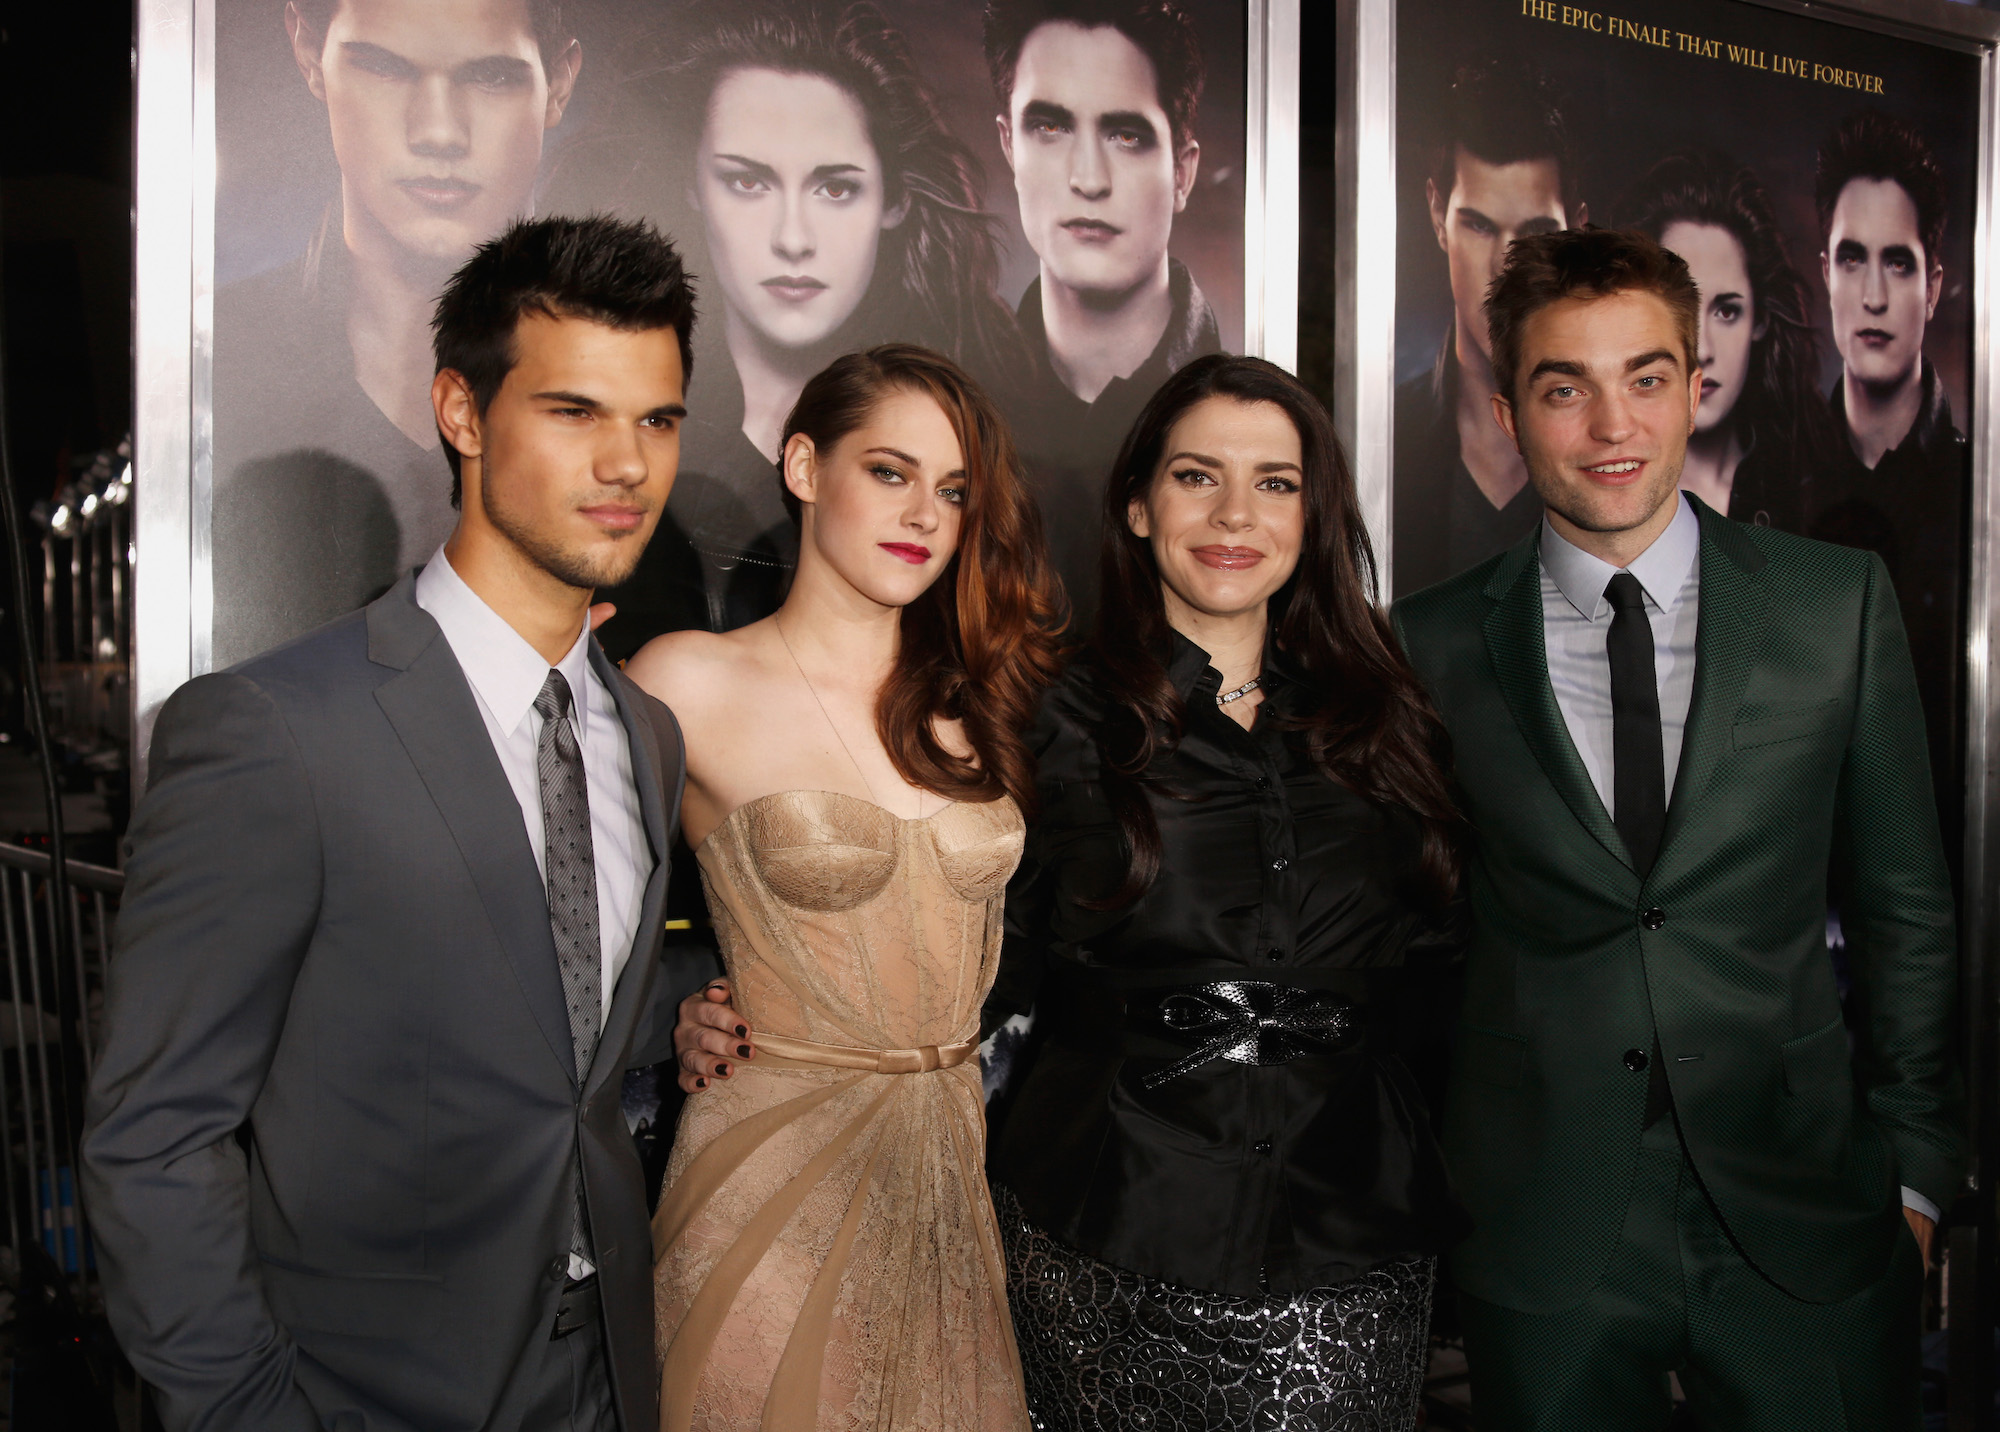 Taylor Lautner, Kristen Stewart, Stephenie Meyer, and Robert Pattinson at 'The Twilight Saga: Breaking Dawn - Part 2' Los Angeles premiere on Nov. 12, 2012